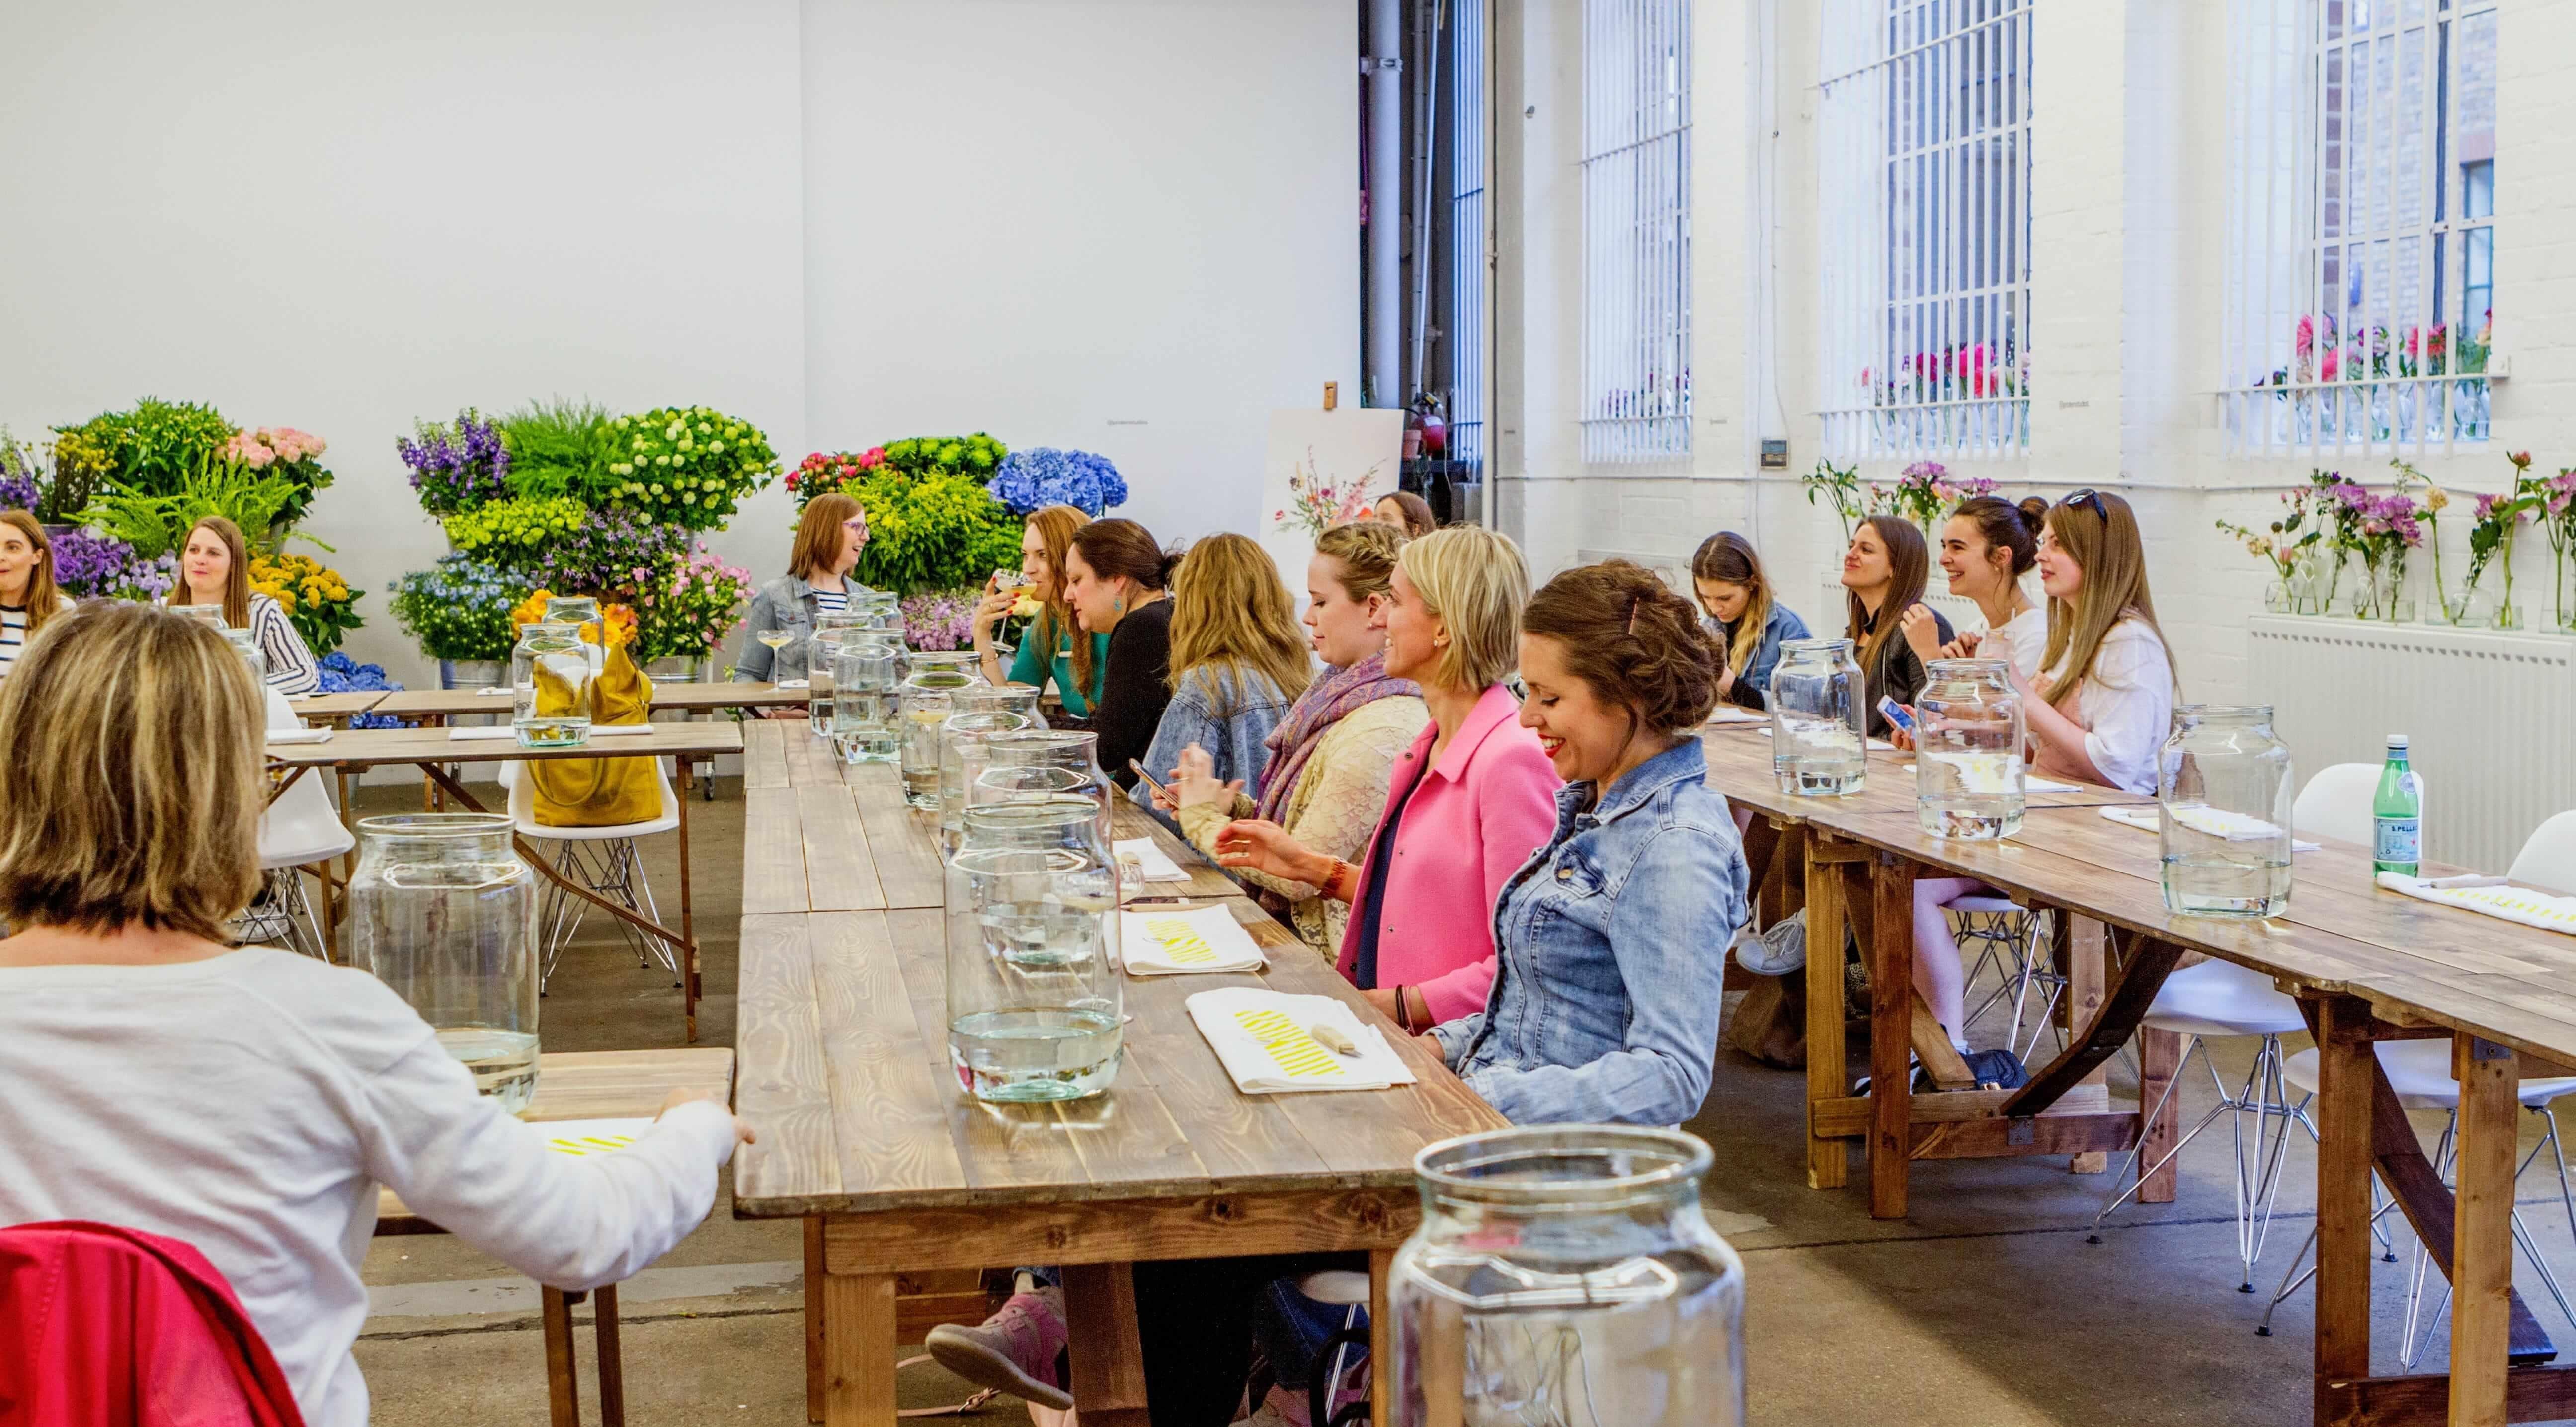 Bloomon Workshop: 23 mei 2018 | Roeselare, Ju